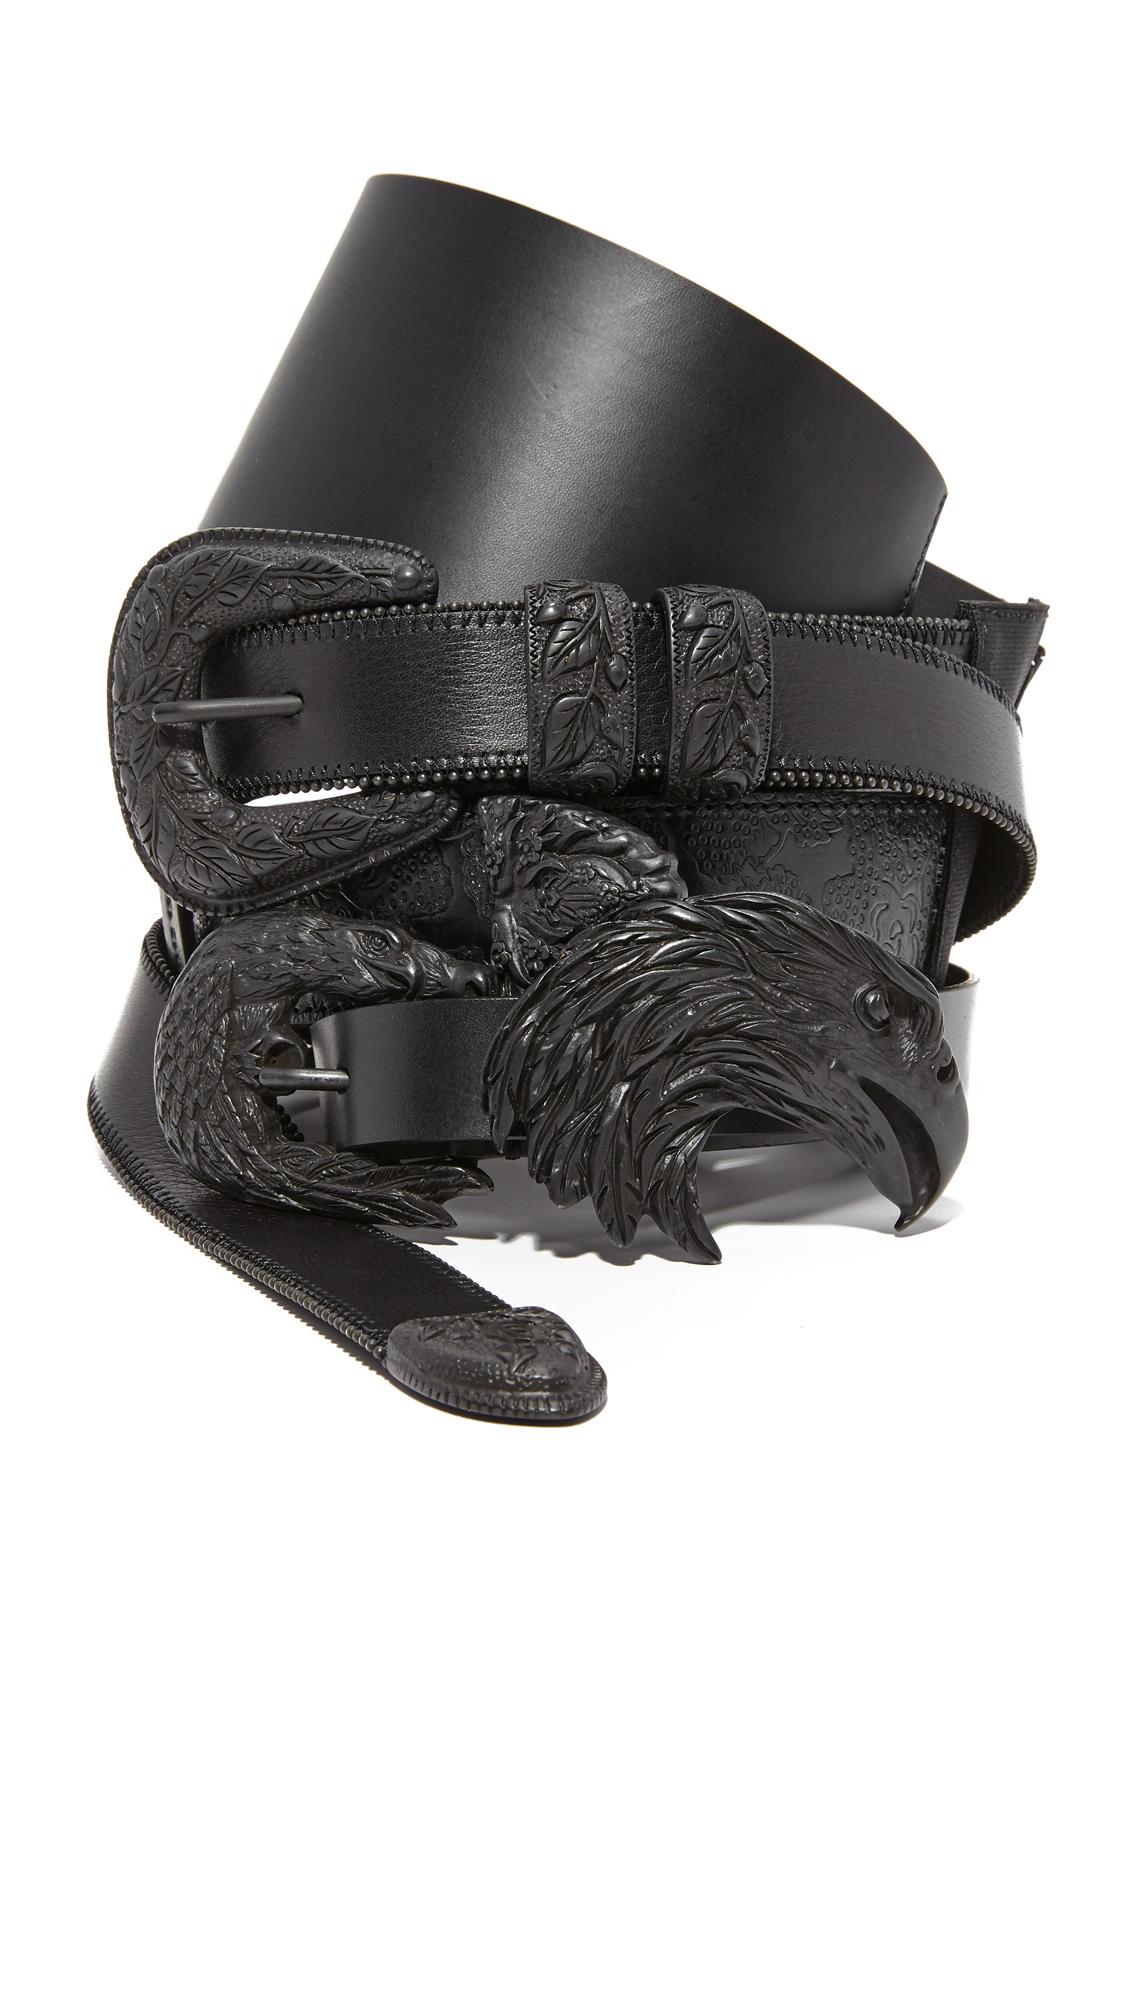 Maison Margiela Belt - Black at Shopbop